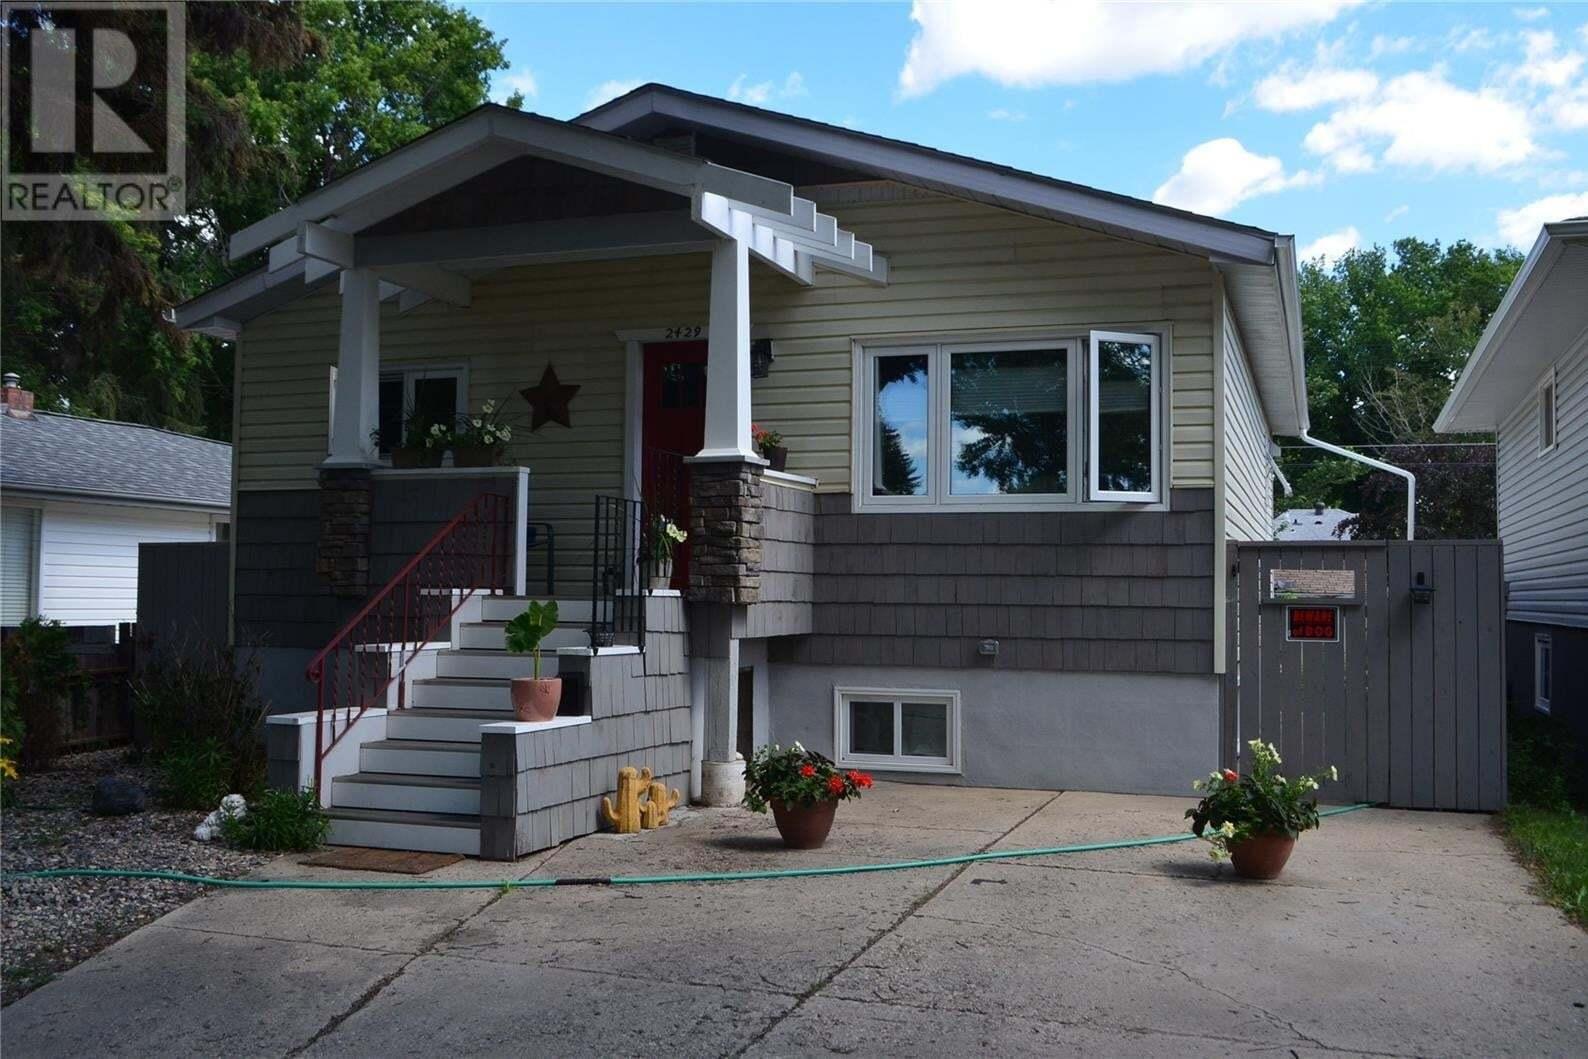 House for sale at 2429 Melrose Ave Saskatoon Saskatchewan - MLS: SK819220